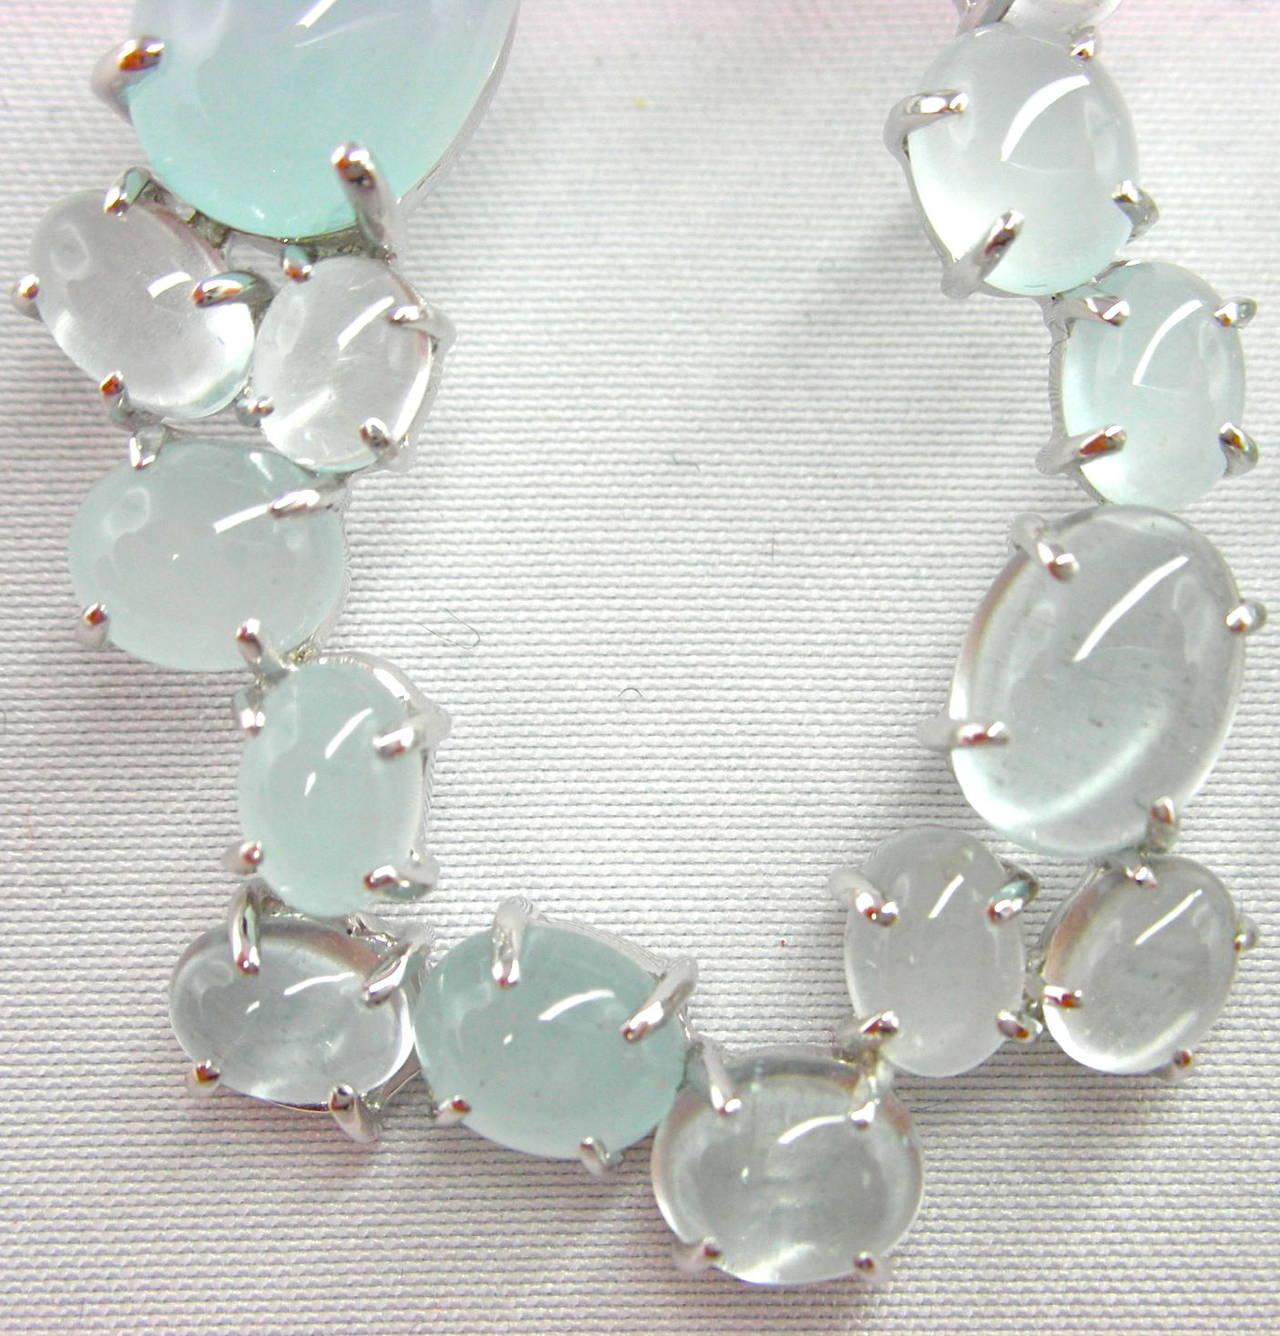 Cabochon Aquamarine Gold Oval Garland Drop Earrings 2